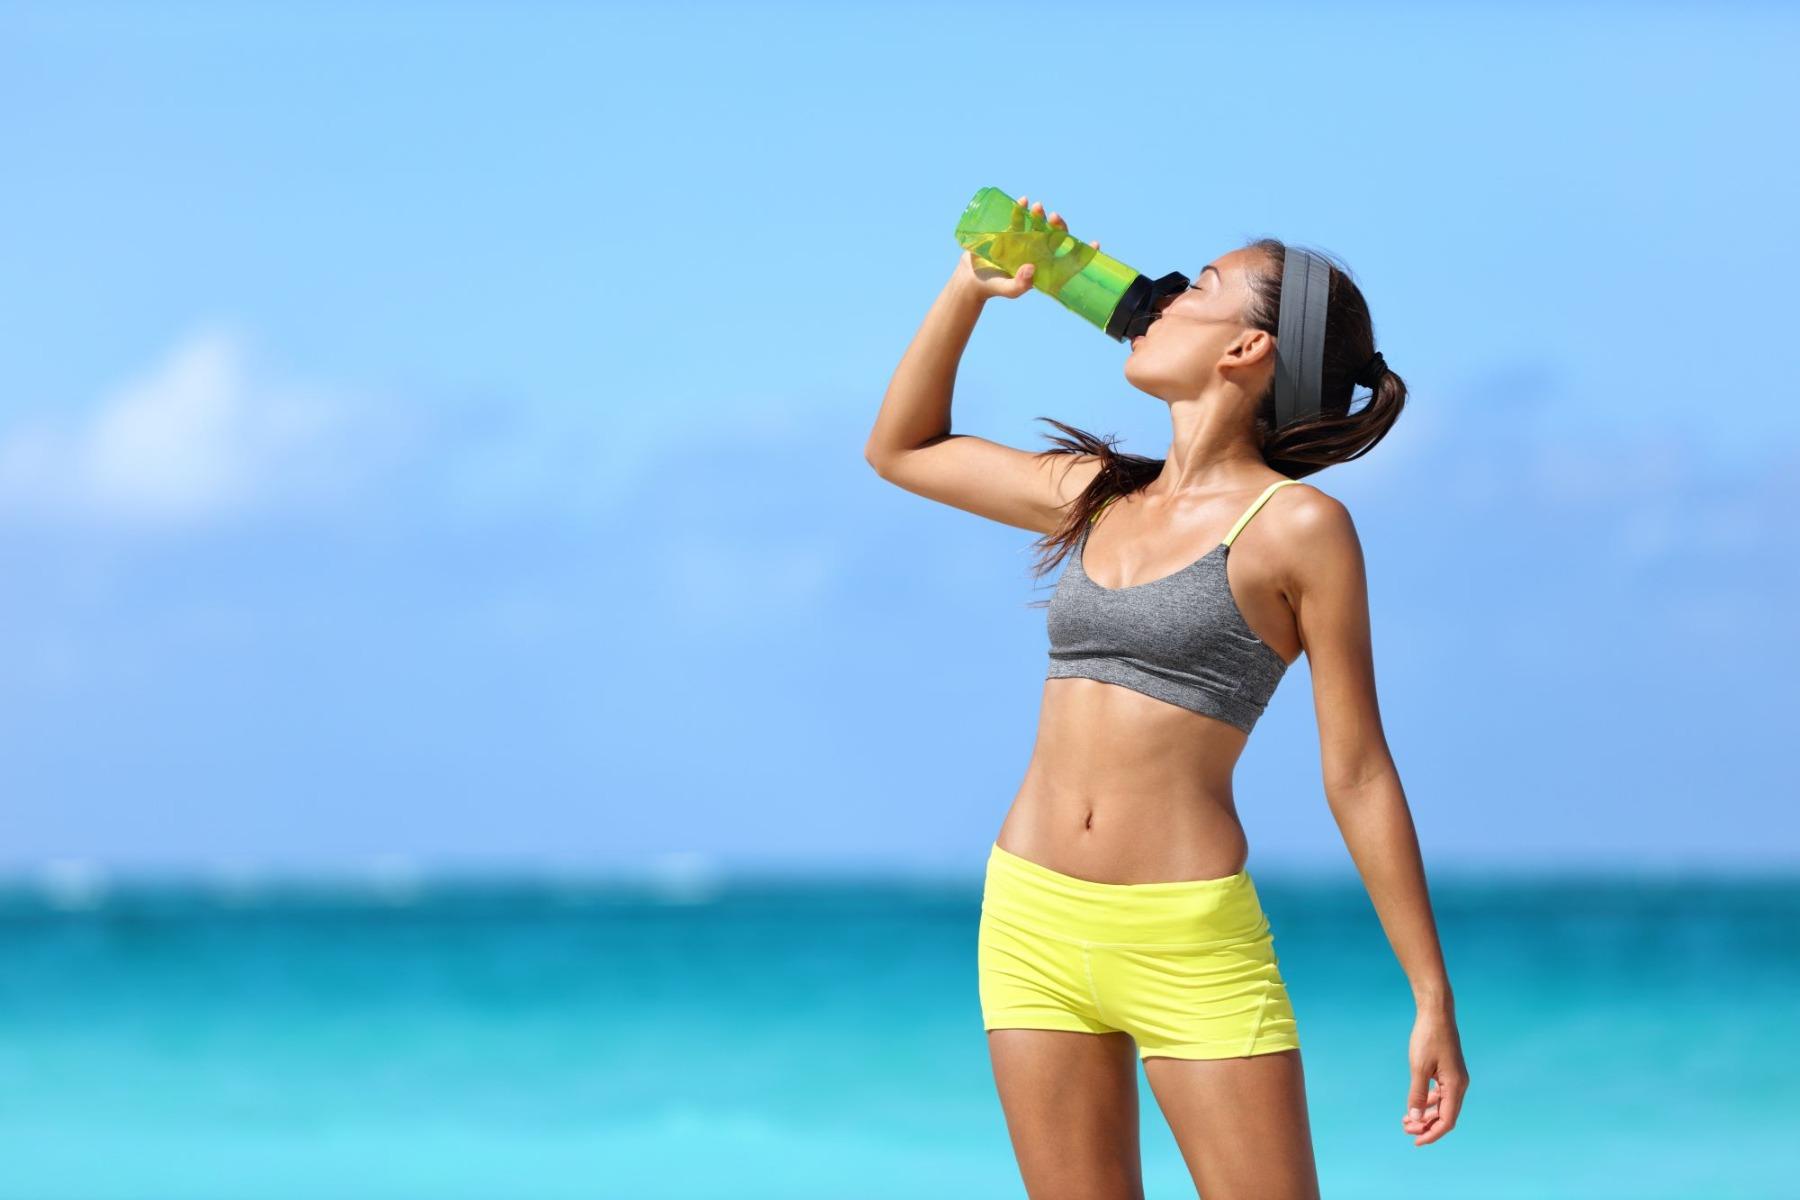 Woman in workout gear standing on beach drinking water from water bottle